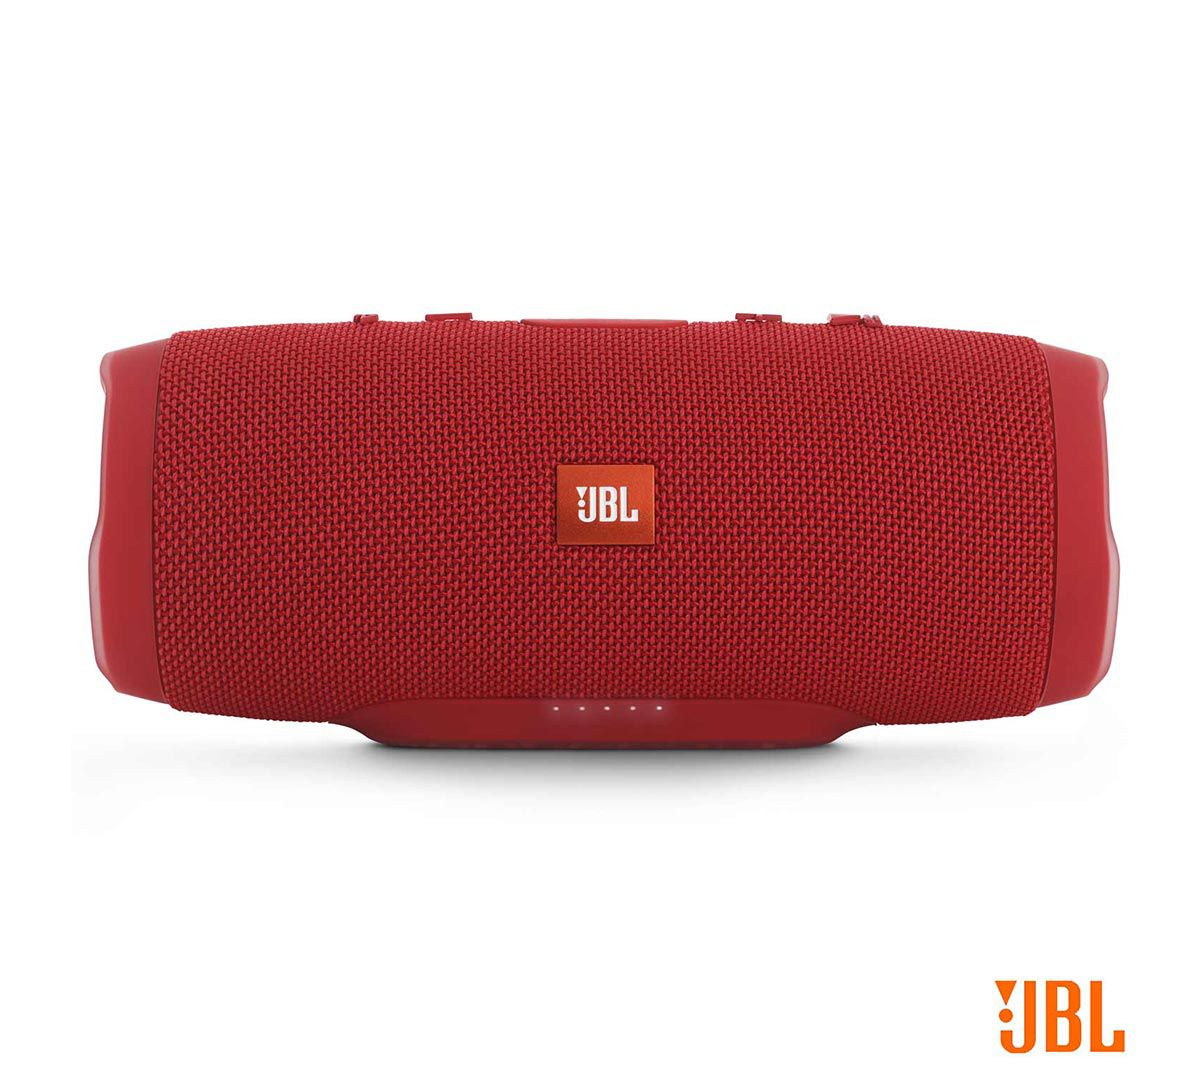 Caixa Som Bluetooth Jbl Charge 3 Portátil Prova D'água - Vermelha